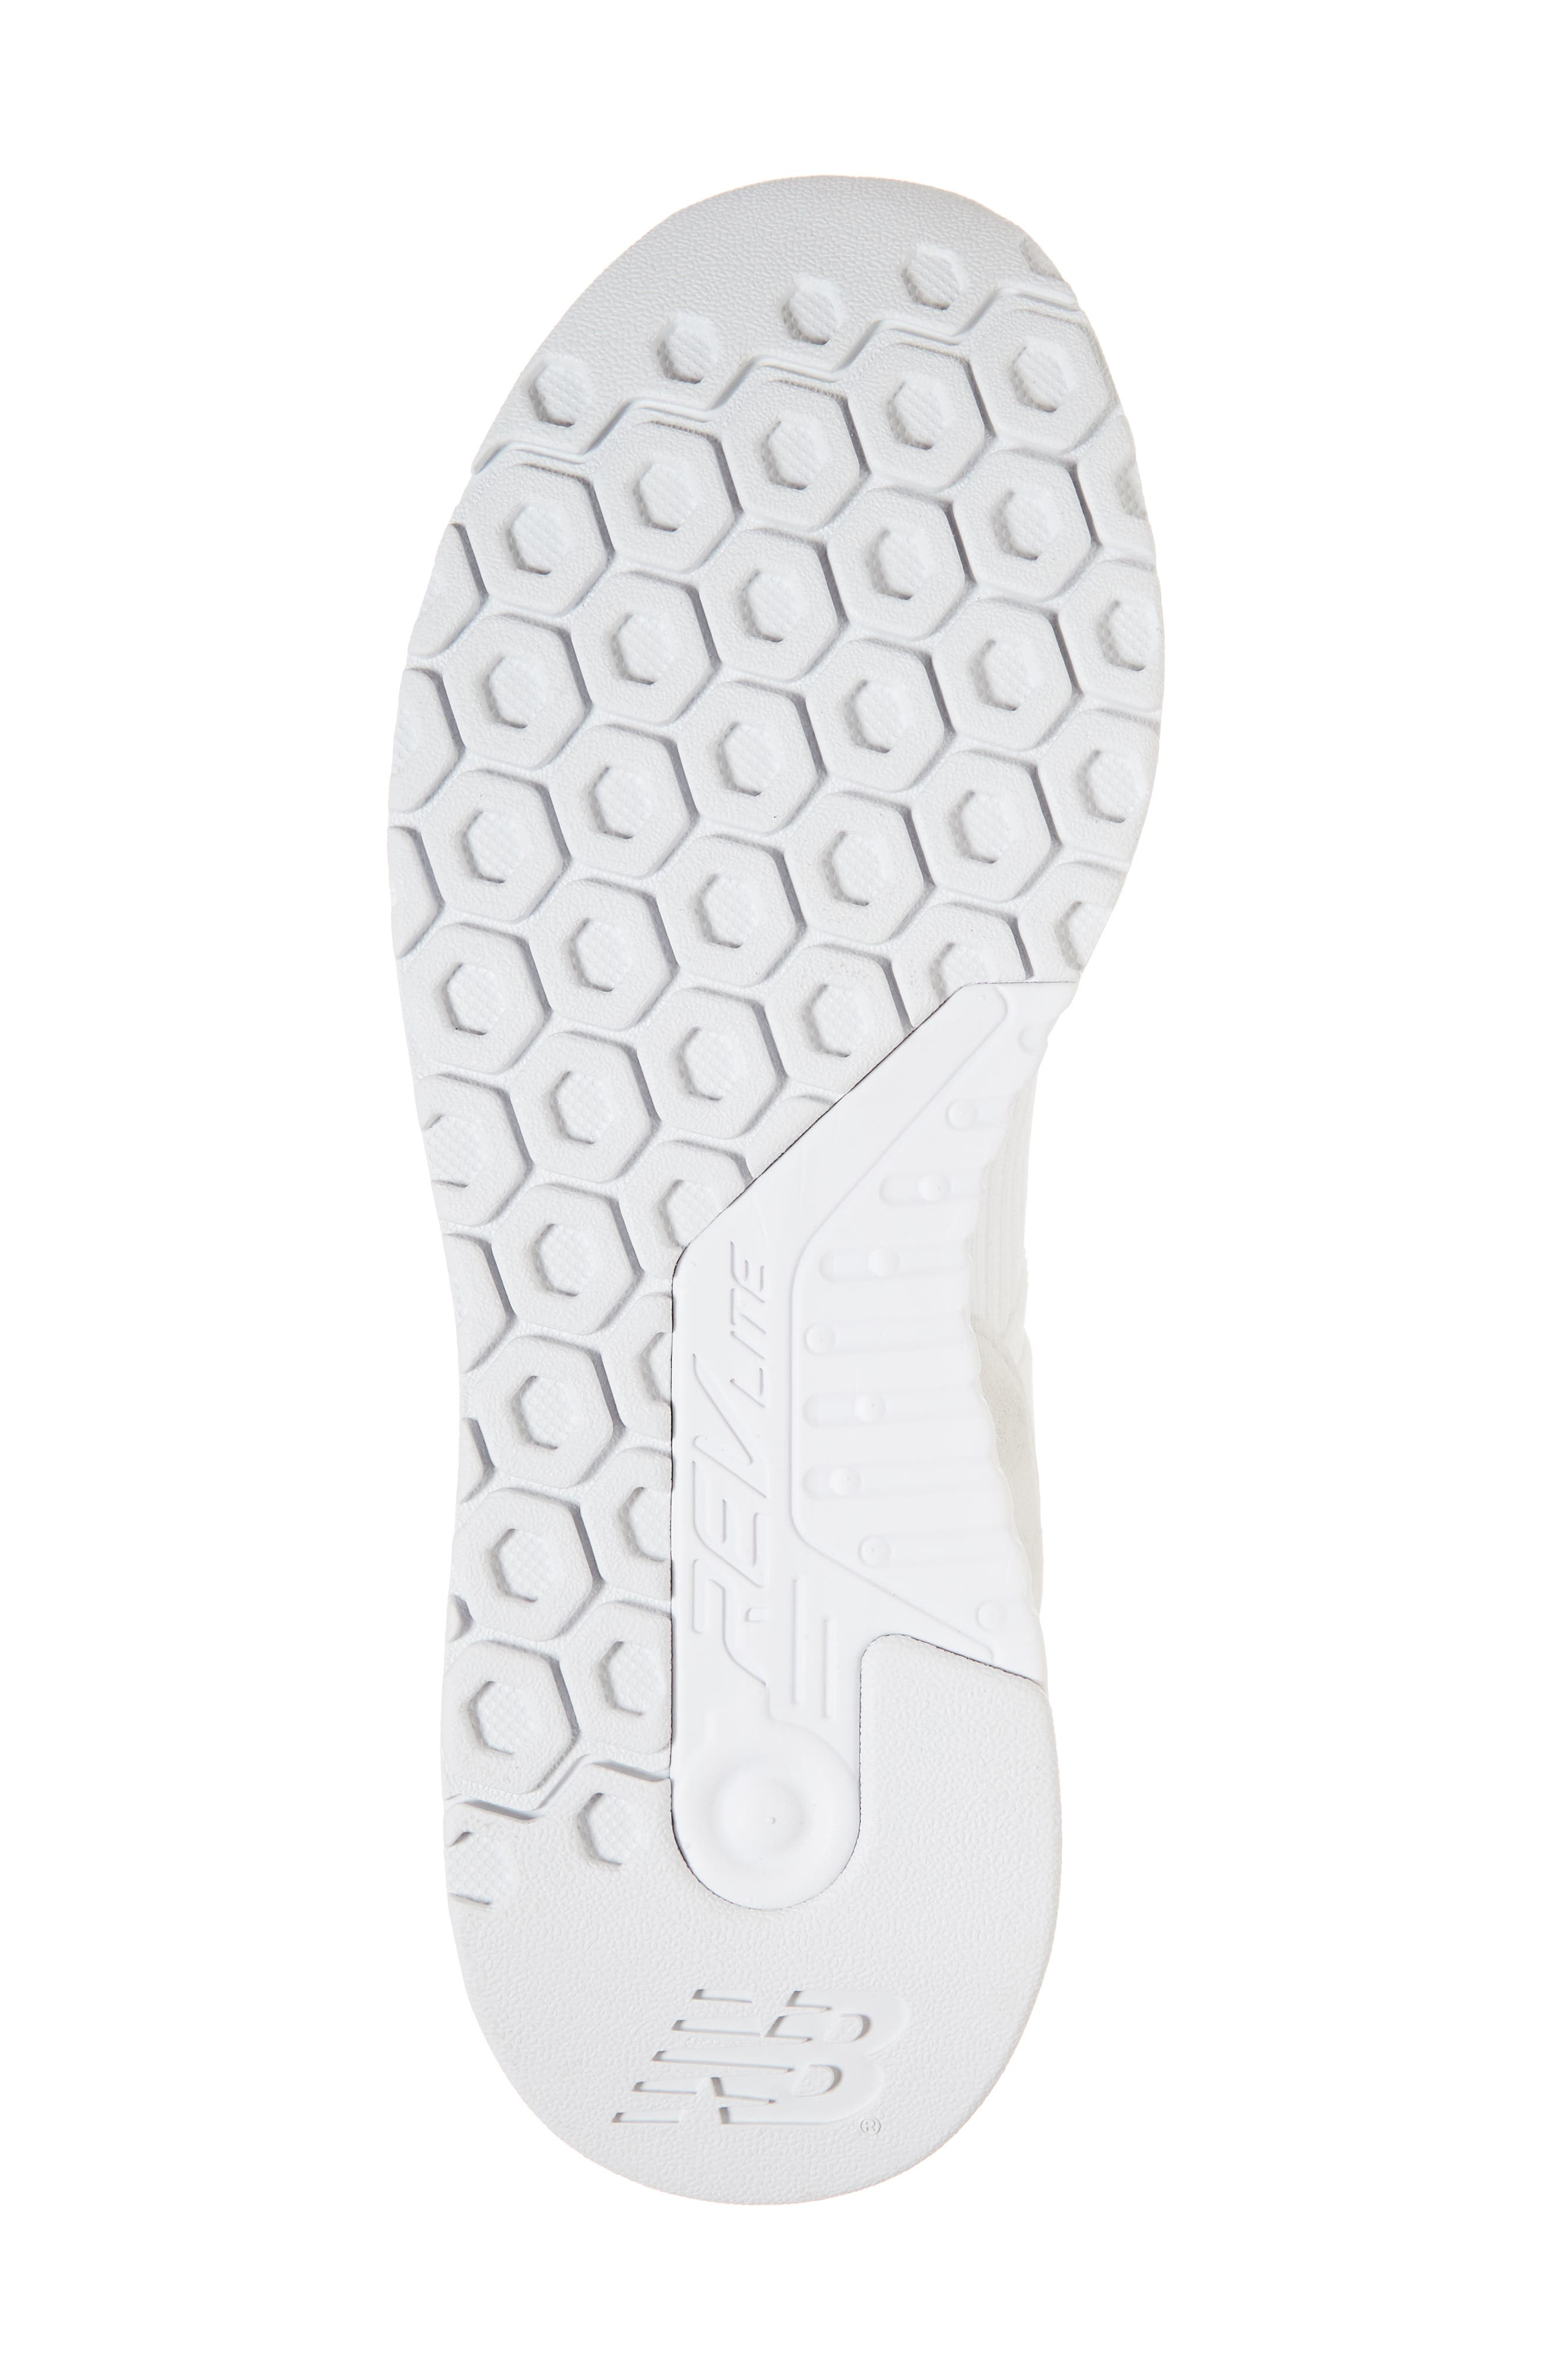 247 Knit Sneaker,                             Alternate thumbnail 6, color,                             WHITE